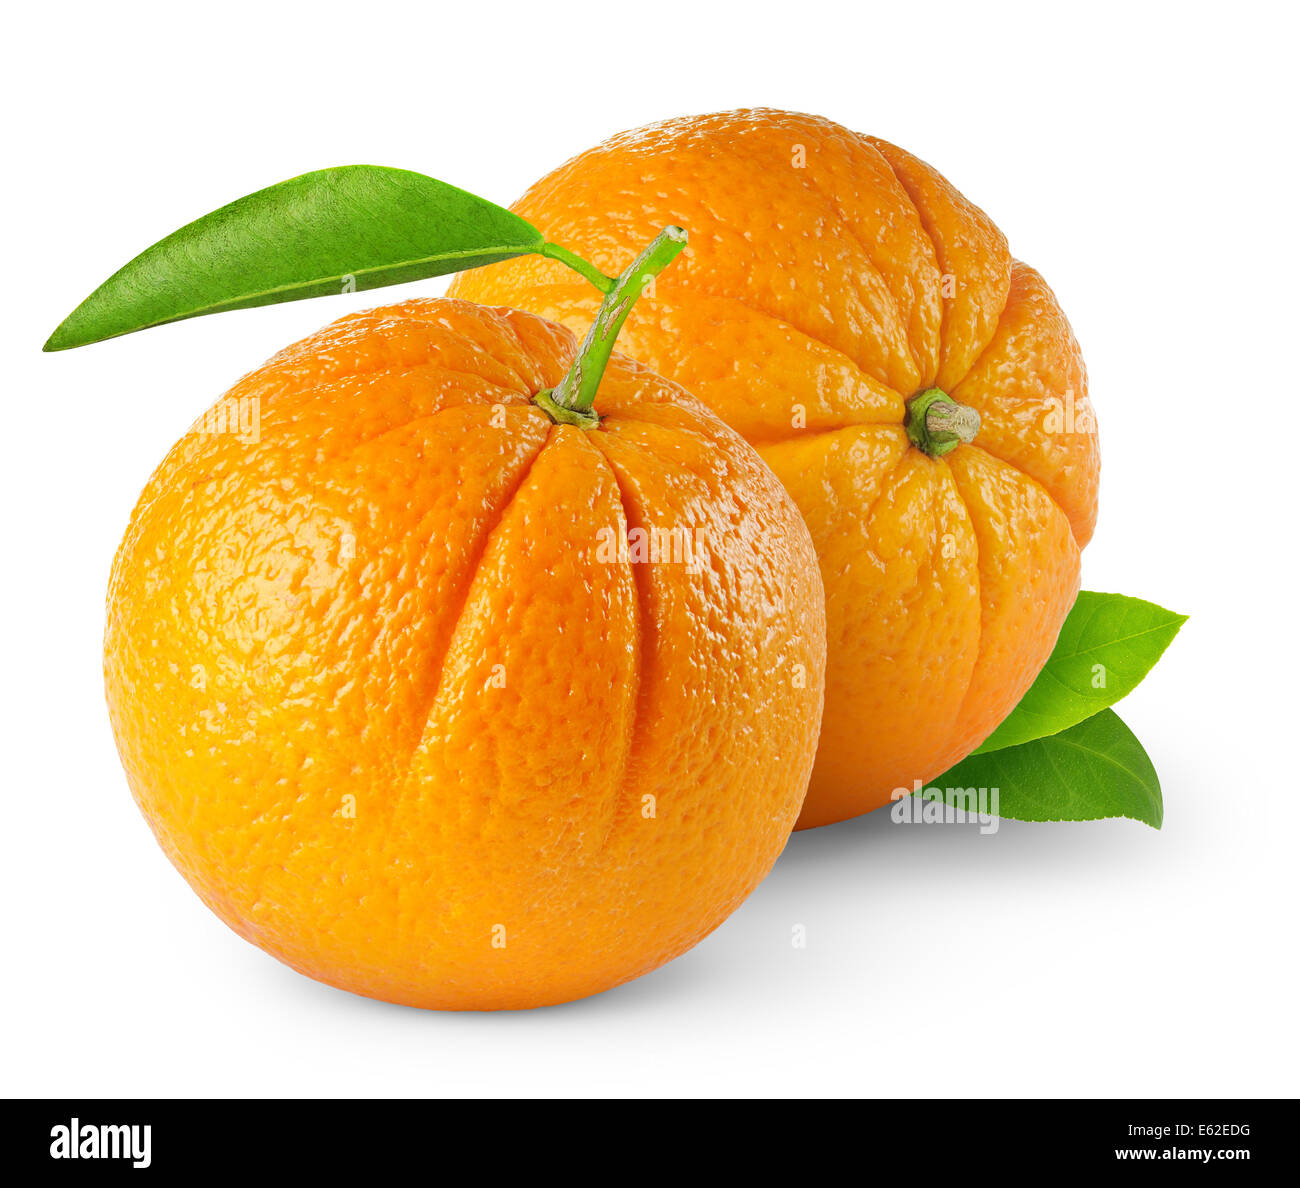 Two oranges on white background - Stock Image